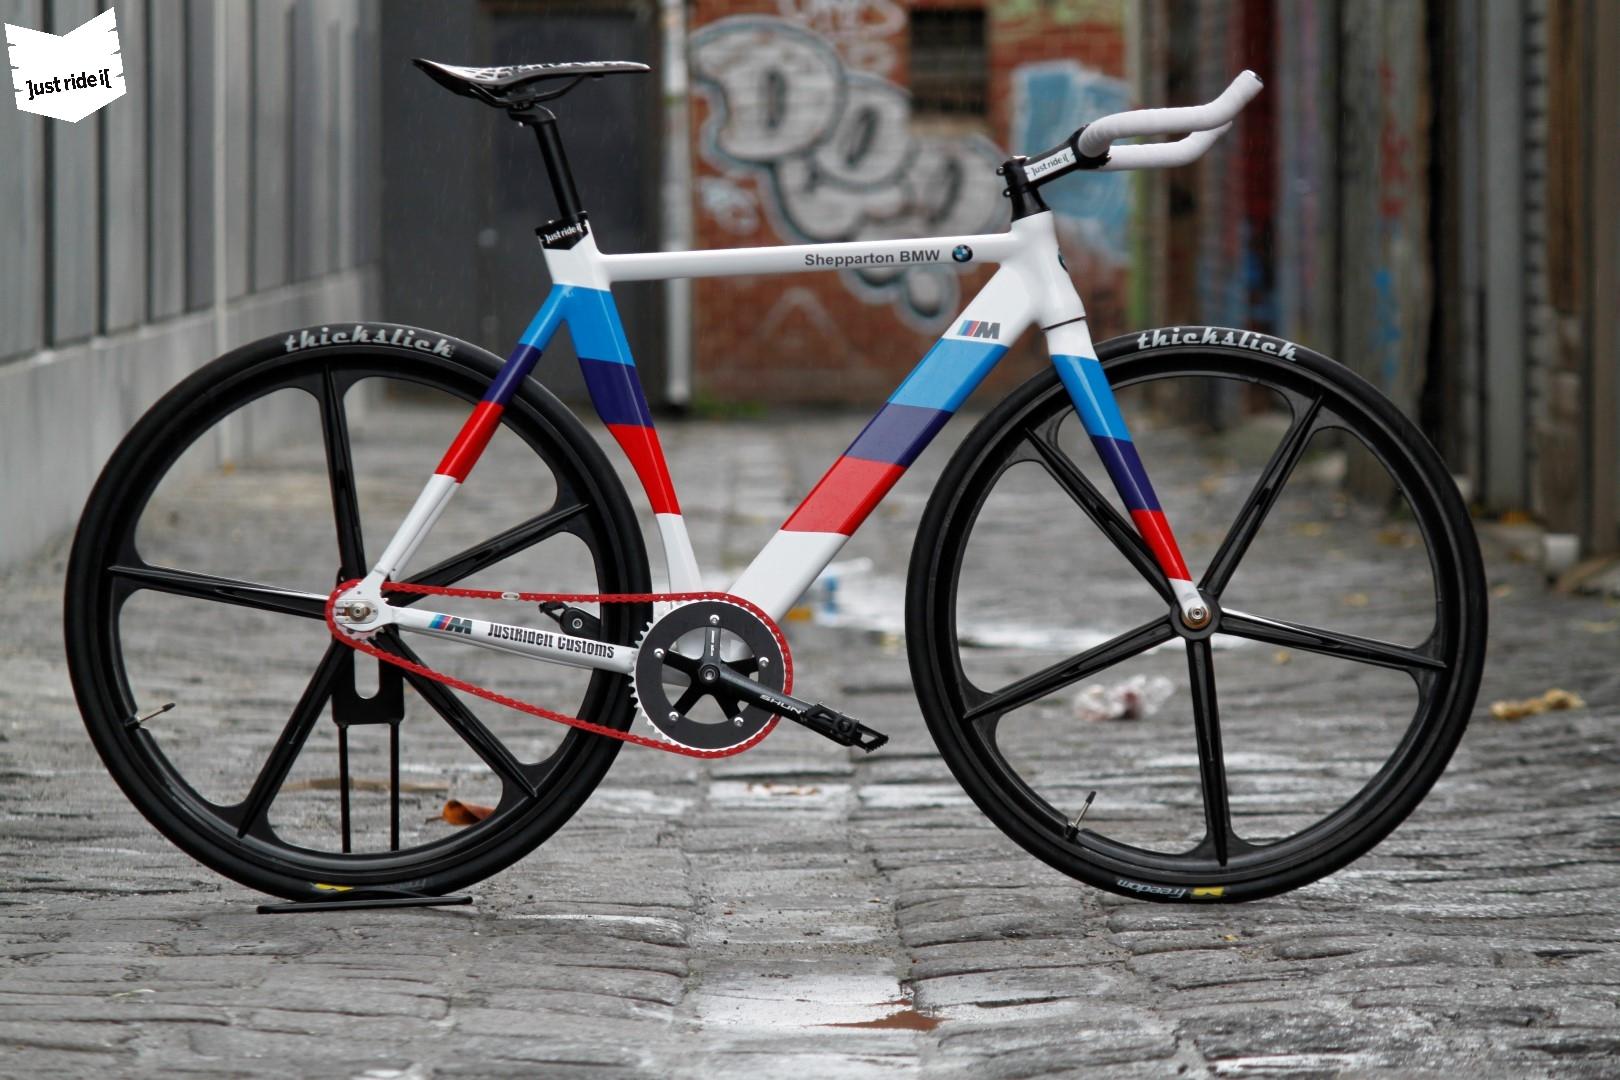 Australian Shop Creates Custom M4 Bike - autoevolution